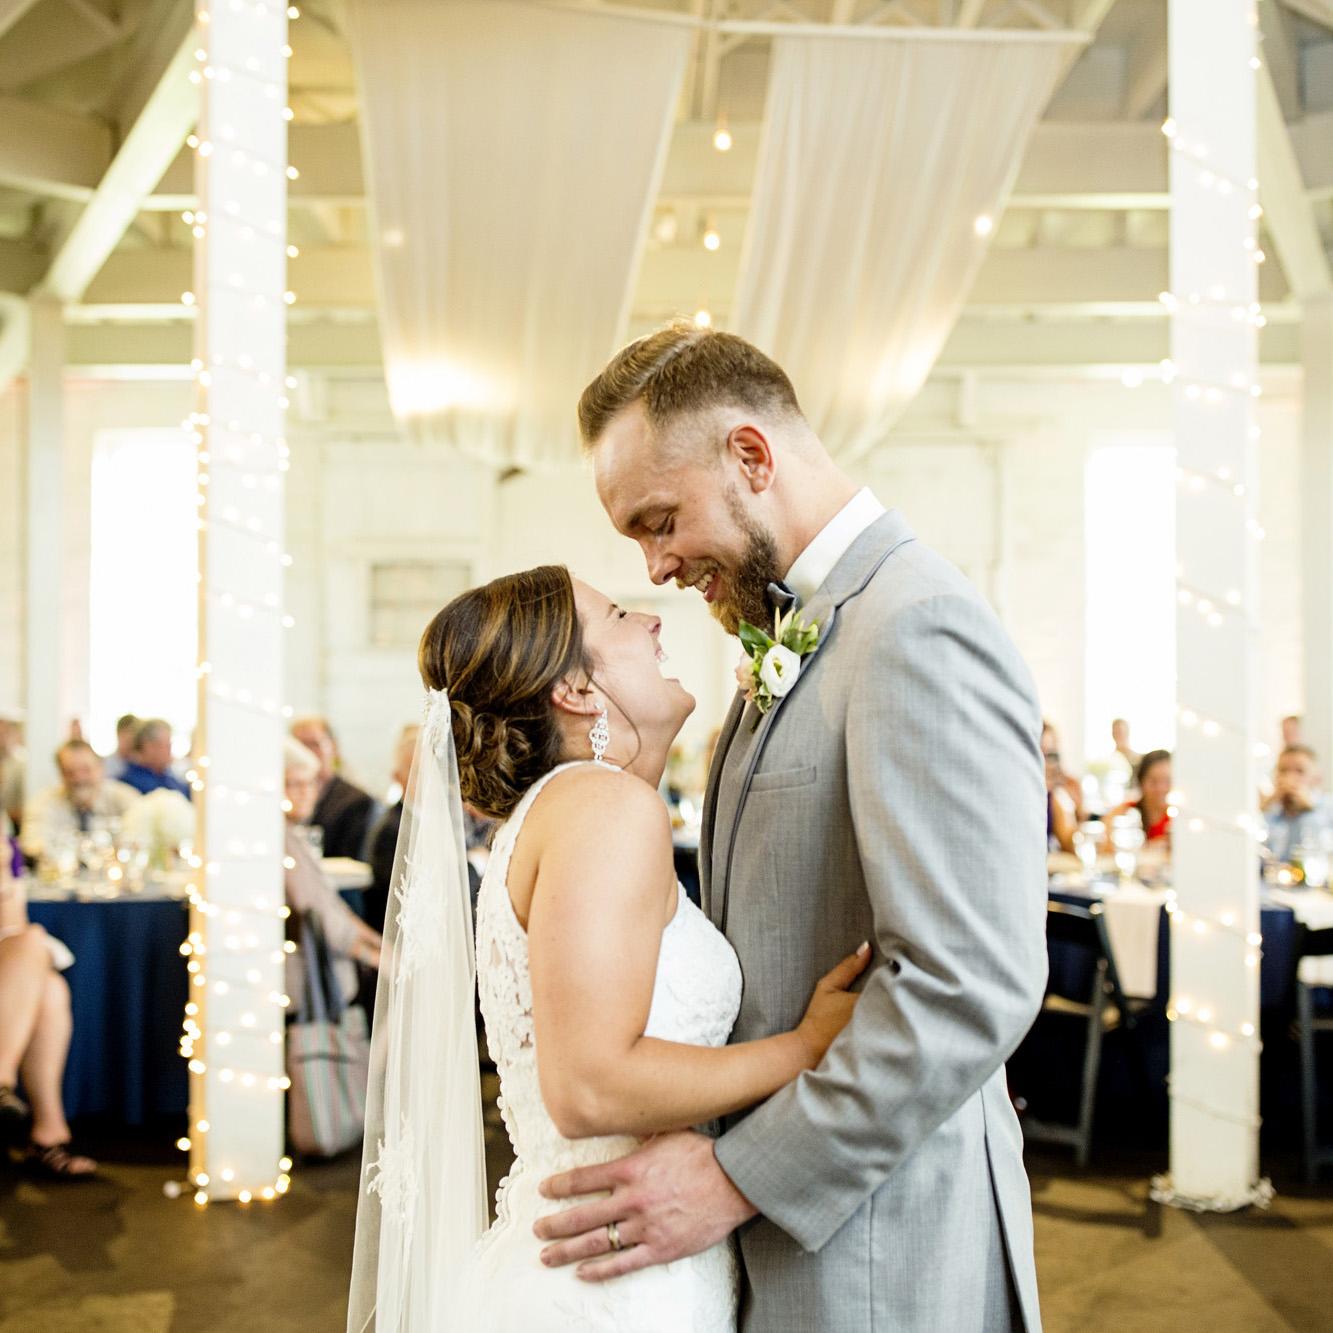 Seriously_Sabrina_Photography_Lexington_Kentucky_Round_Barn_Red_Mile_Stable_of_Memories_Wedding_Hart_96.jpg